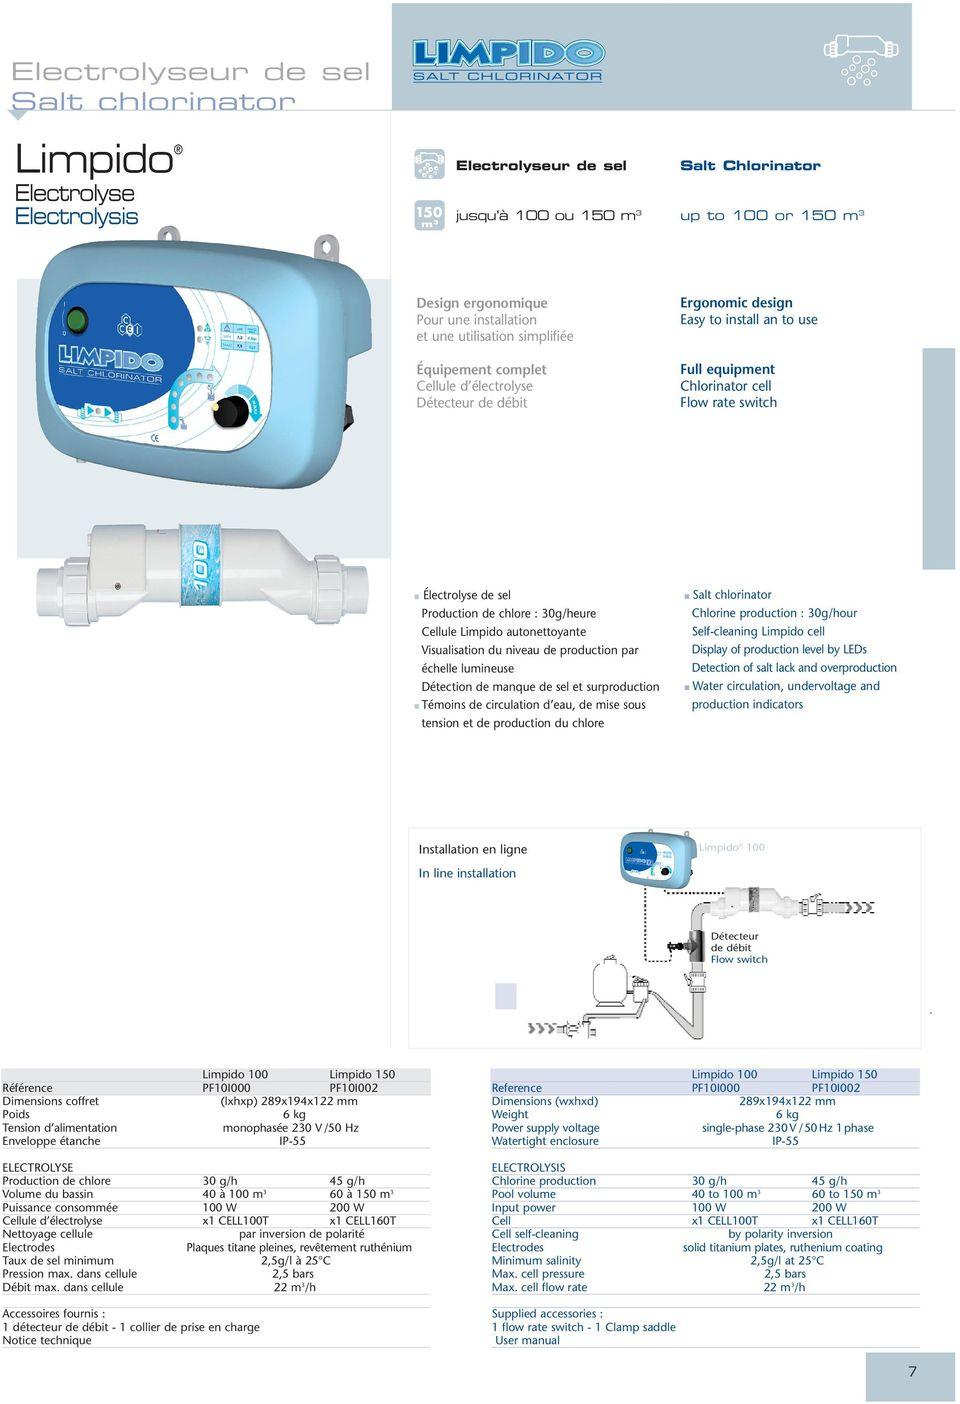 electrolyseur easy lc 60